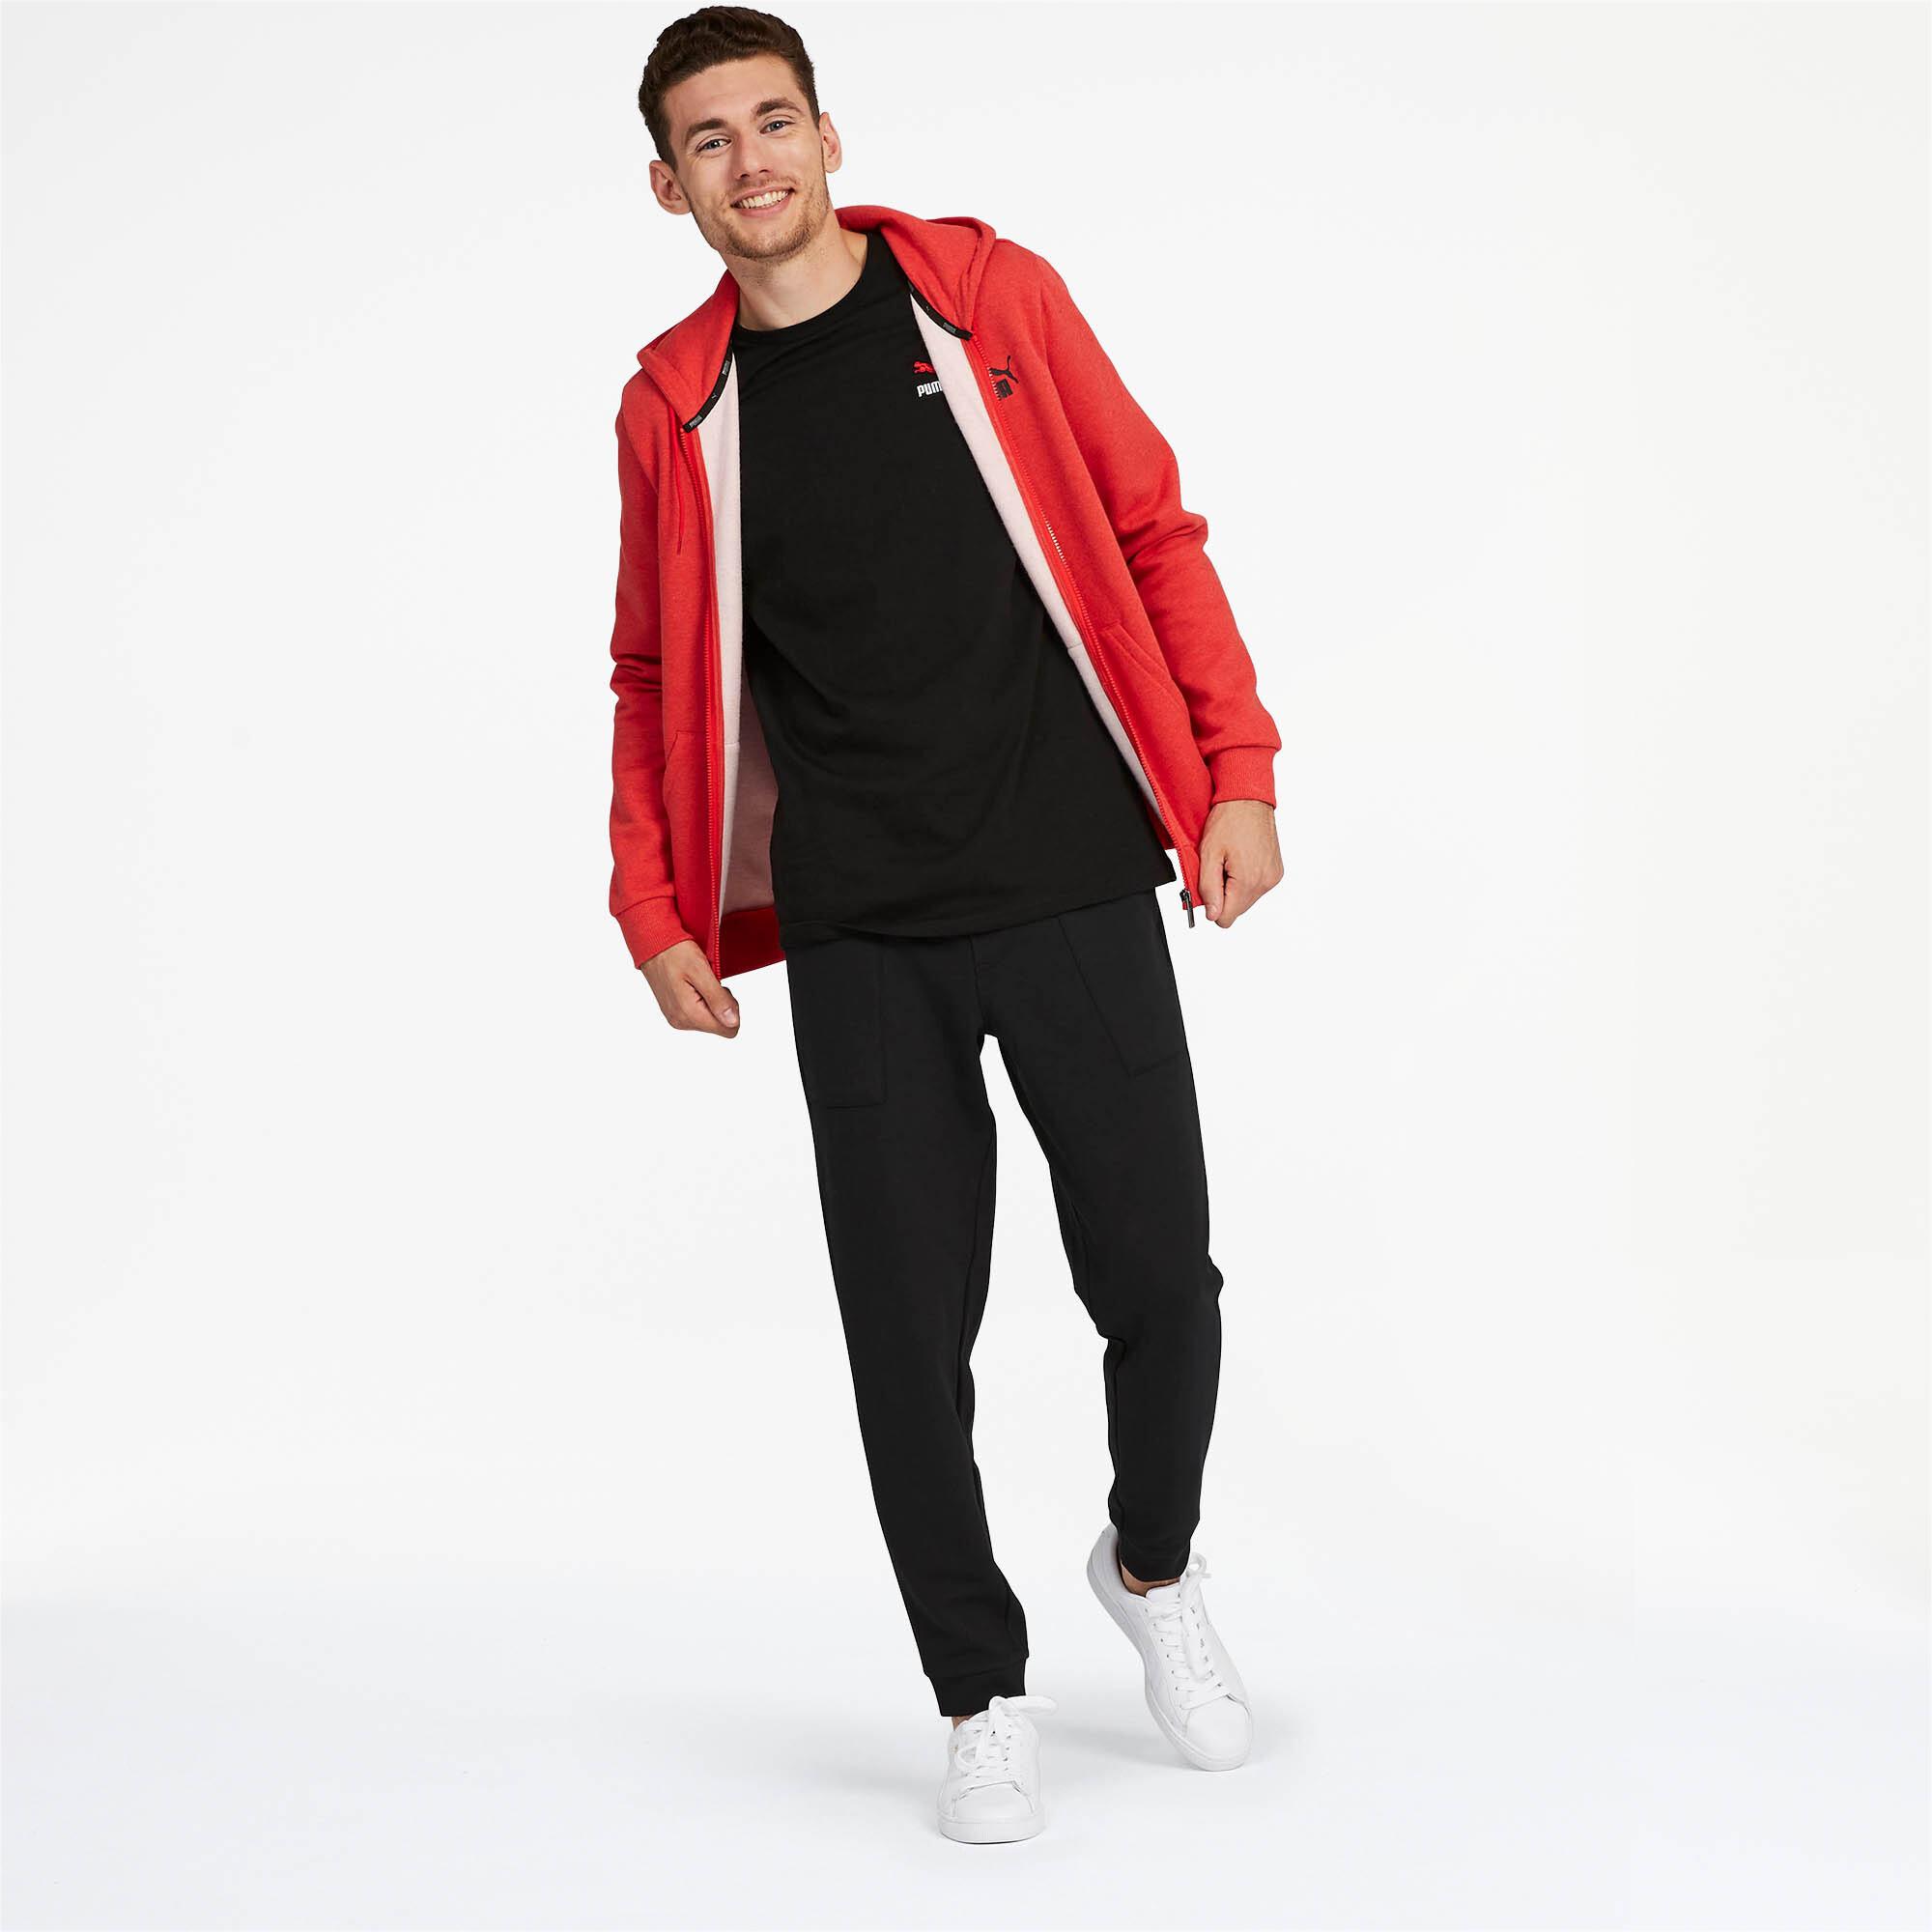 PUMA-Essentials-Men-039-s-Fleece-Hooded-Jacket-Men-Sweat-Basics thumbnail 13